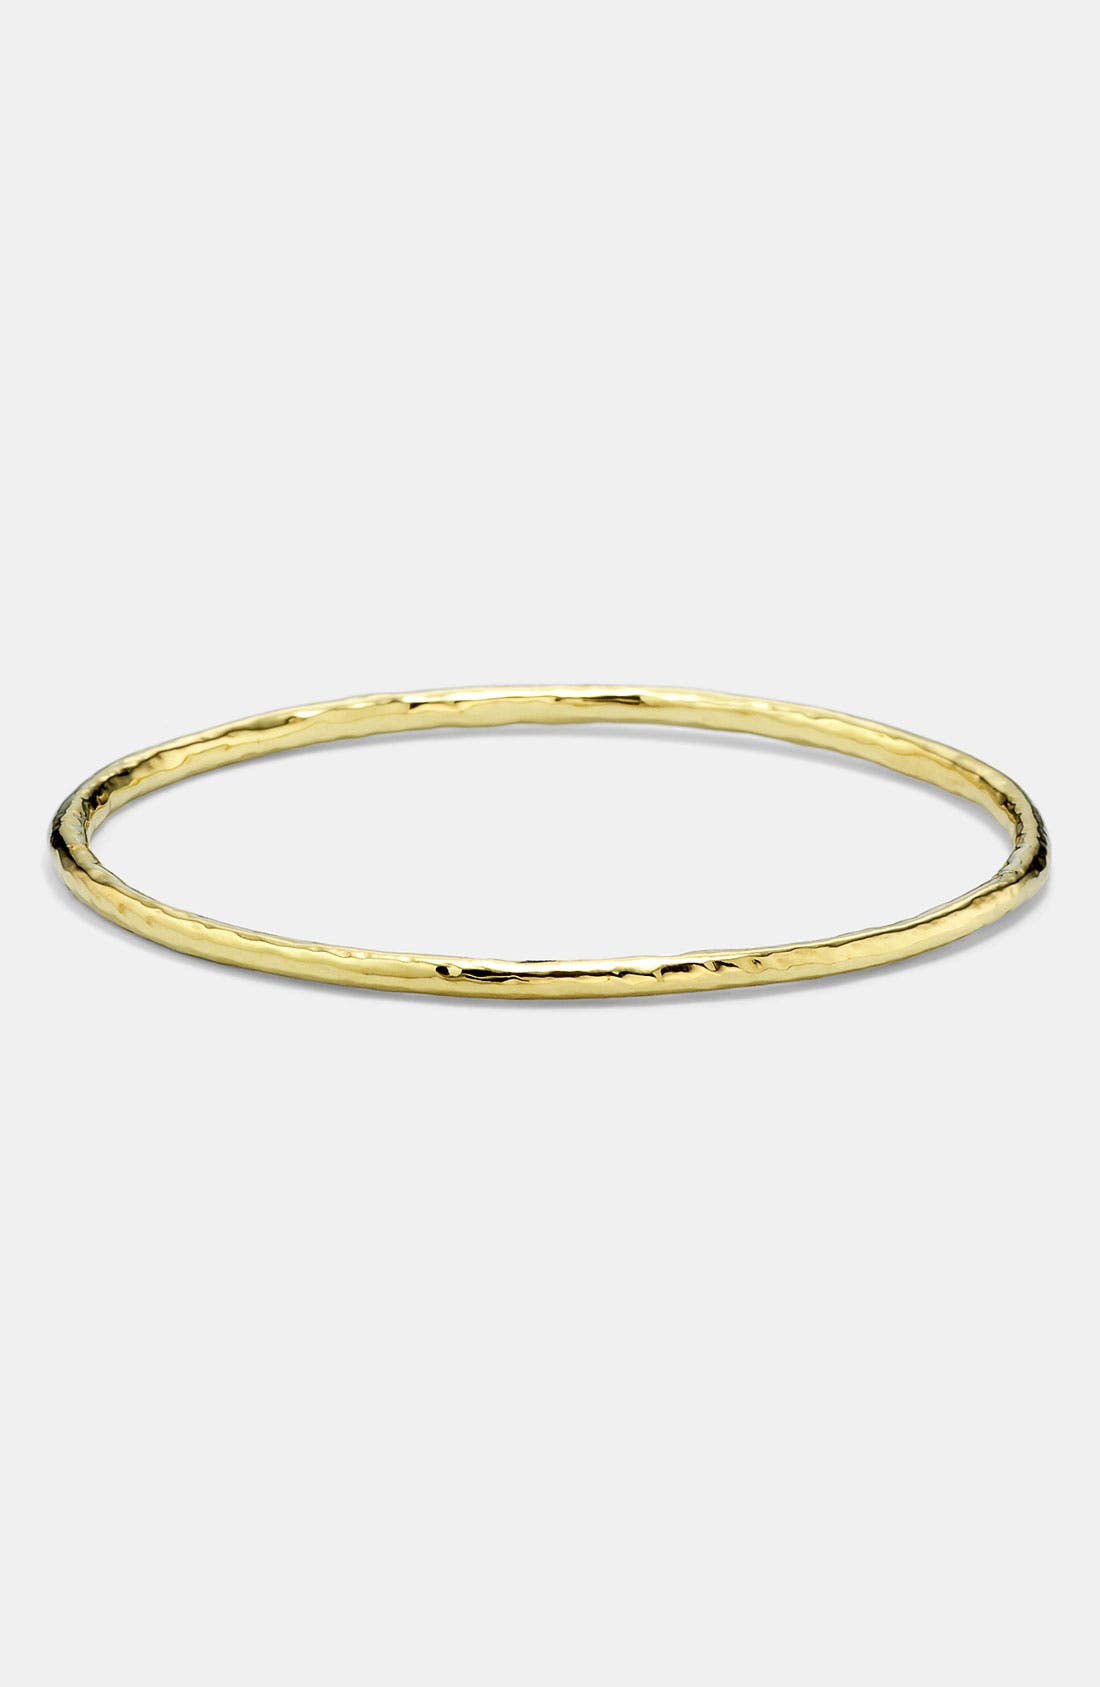 Main Image - Ippolita 'Glamazon' 18k Gold Bangle